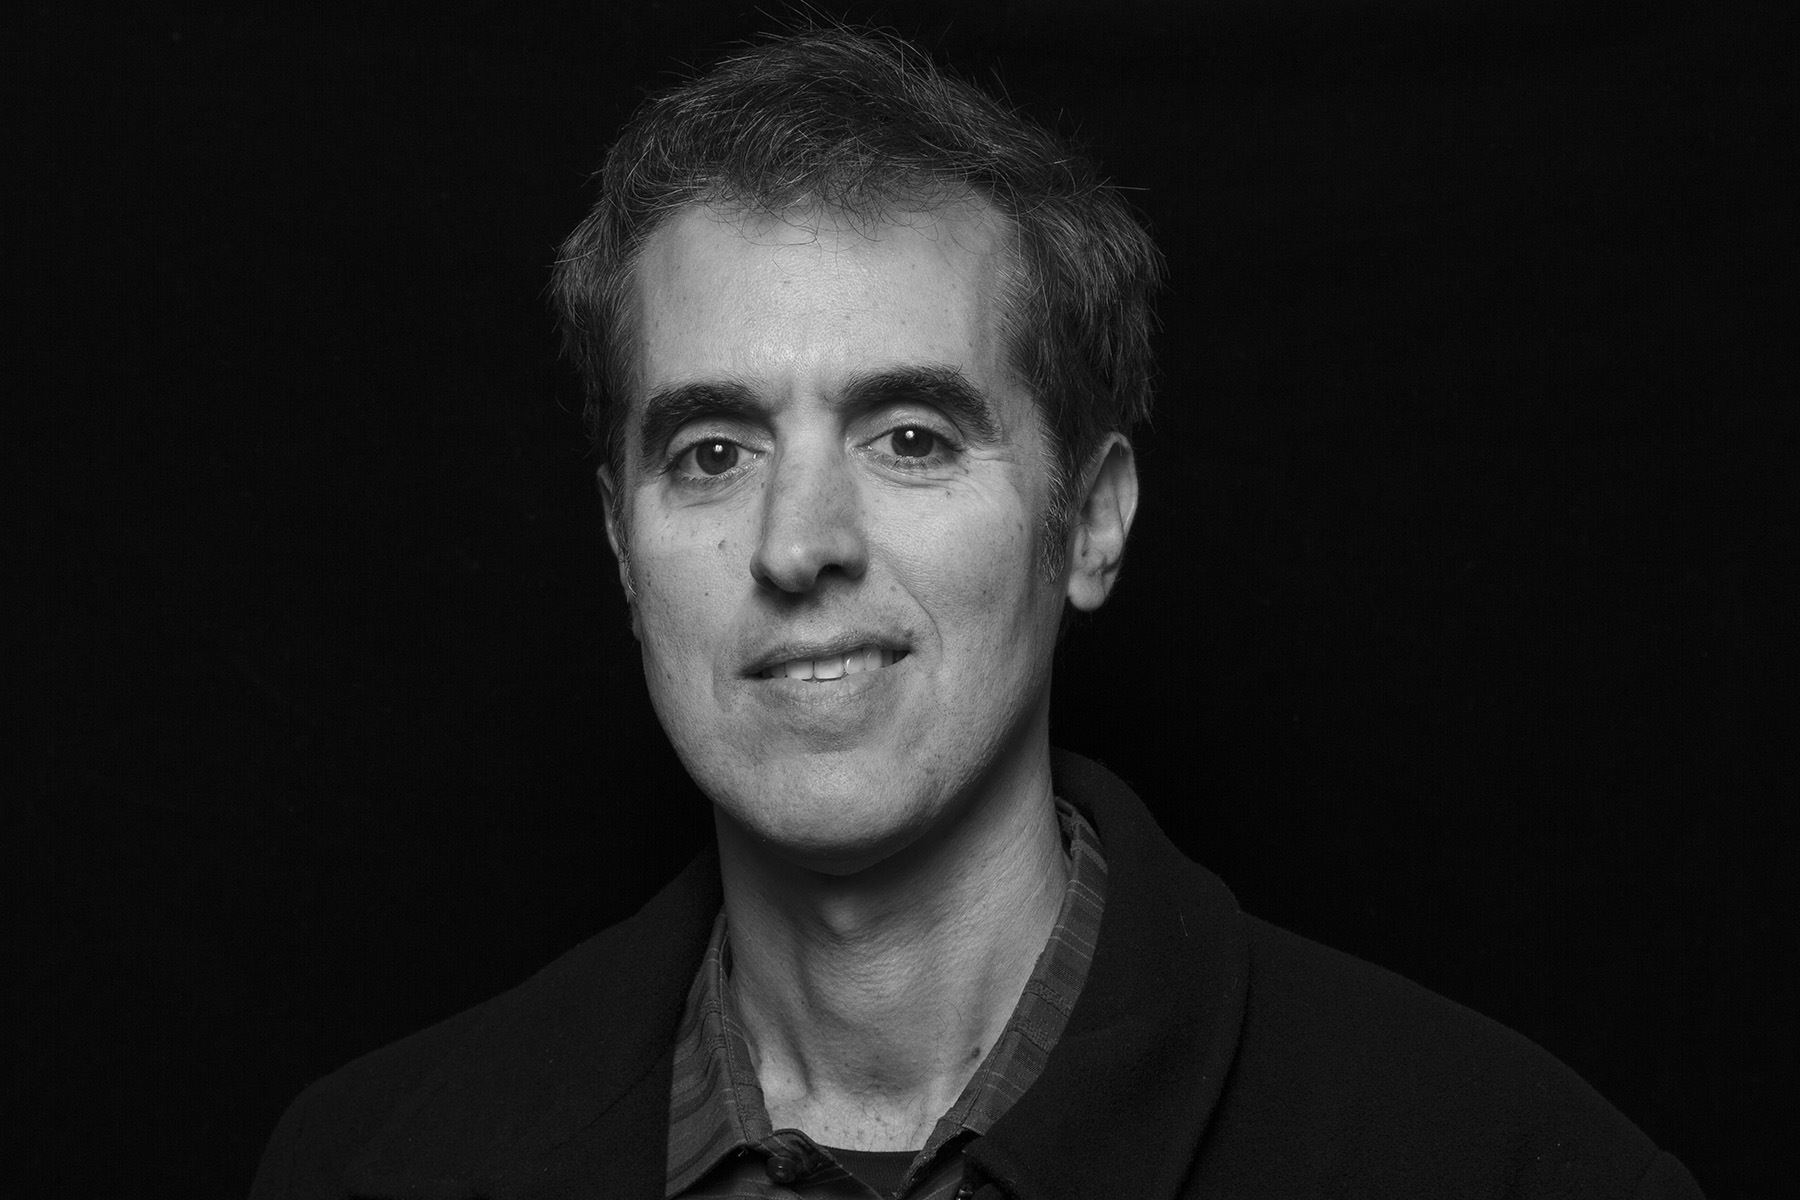 Alvaro Velarde ya trabaja en su próxima apuesta por el cine.